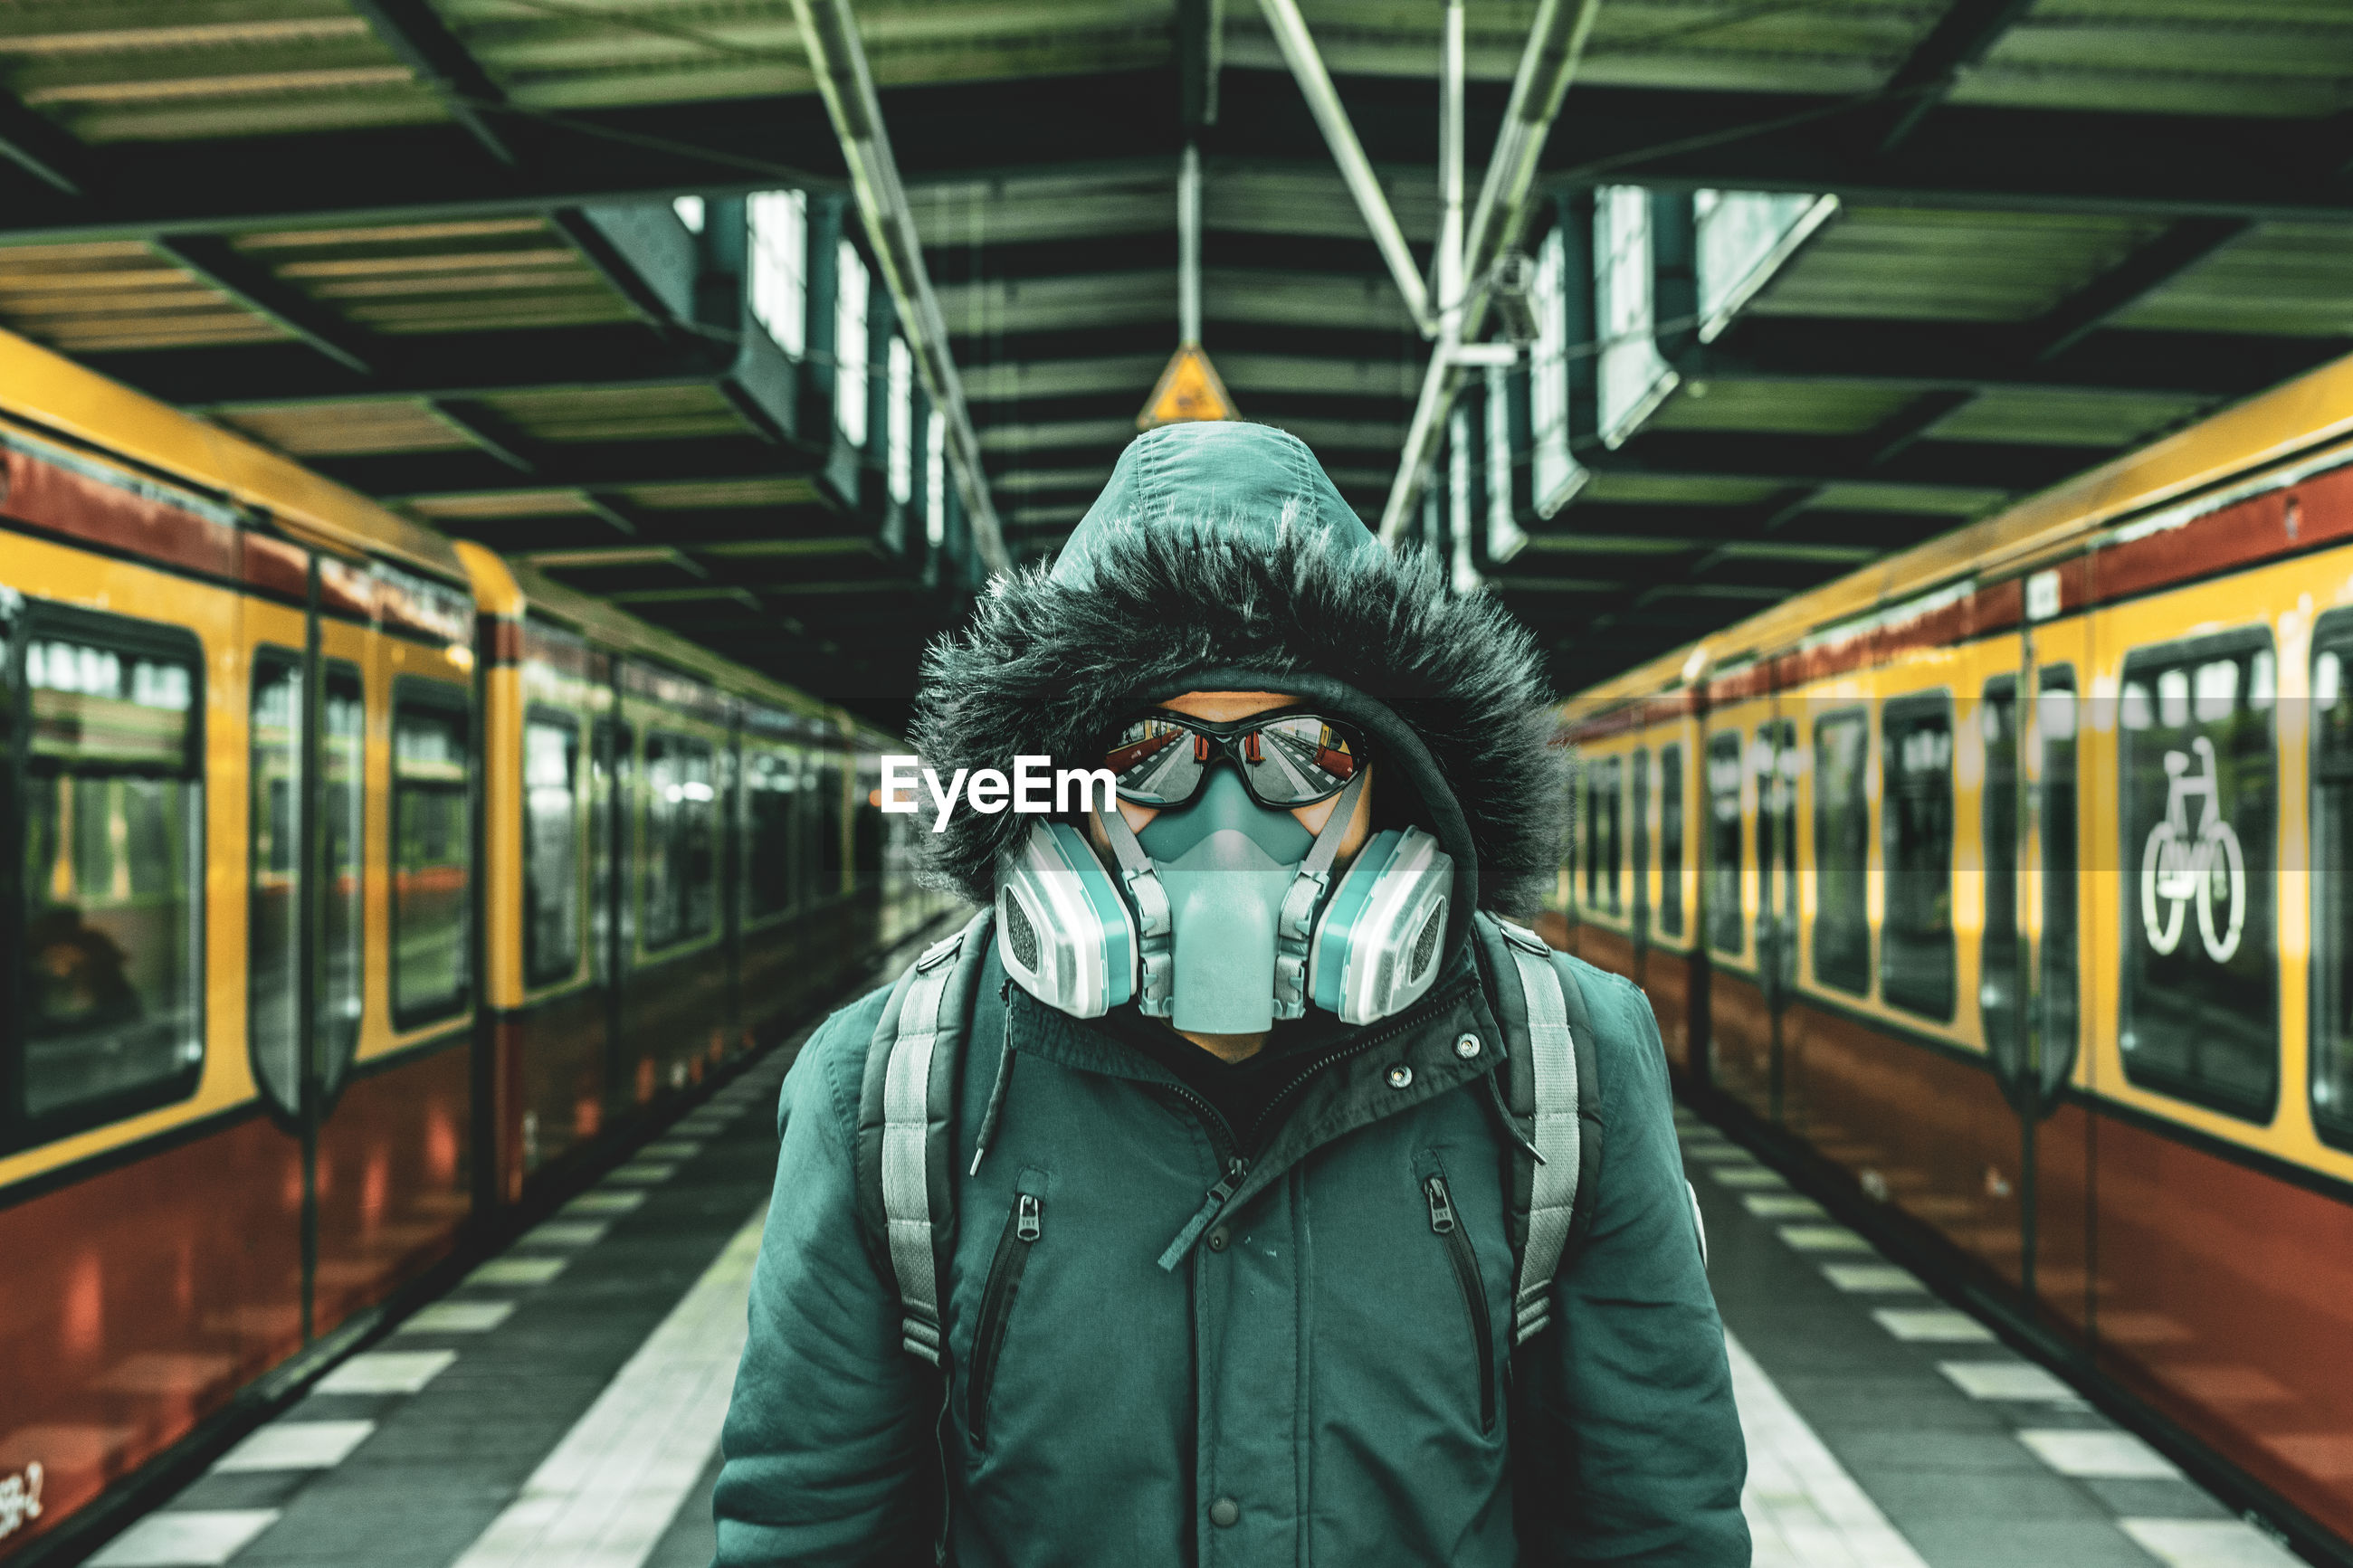 Portrait of man wearing mask standing at railroad station platform